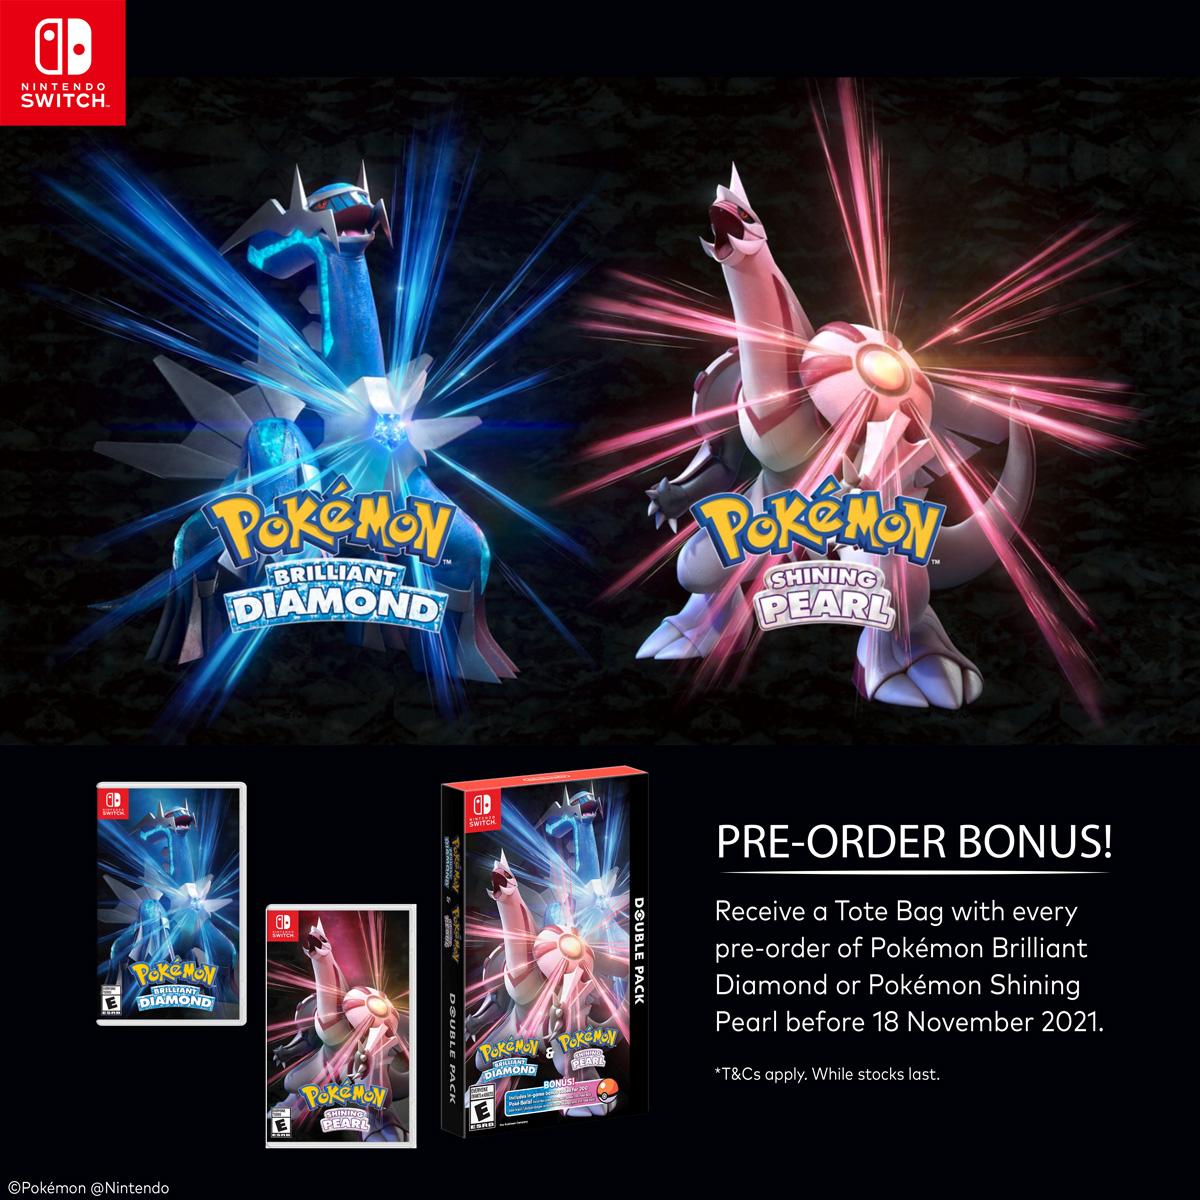 Pre-Order Bonus for Pokémon Brilliant Diamond and Pokémon Shining Pearl